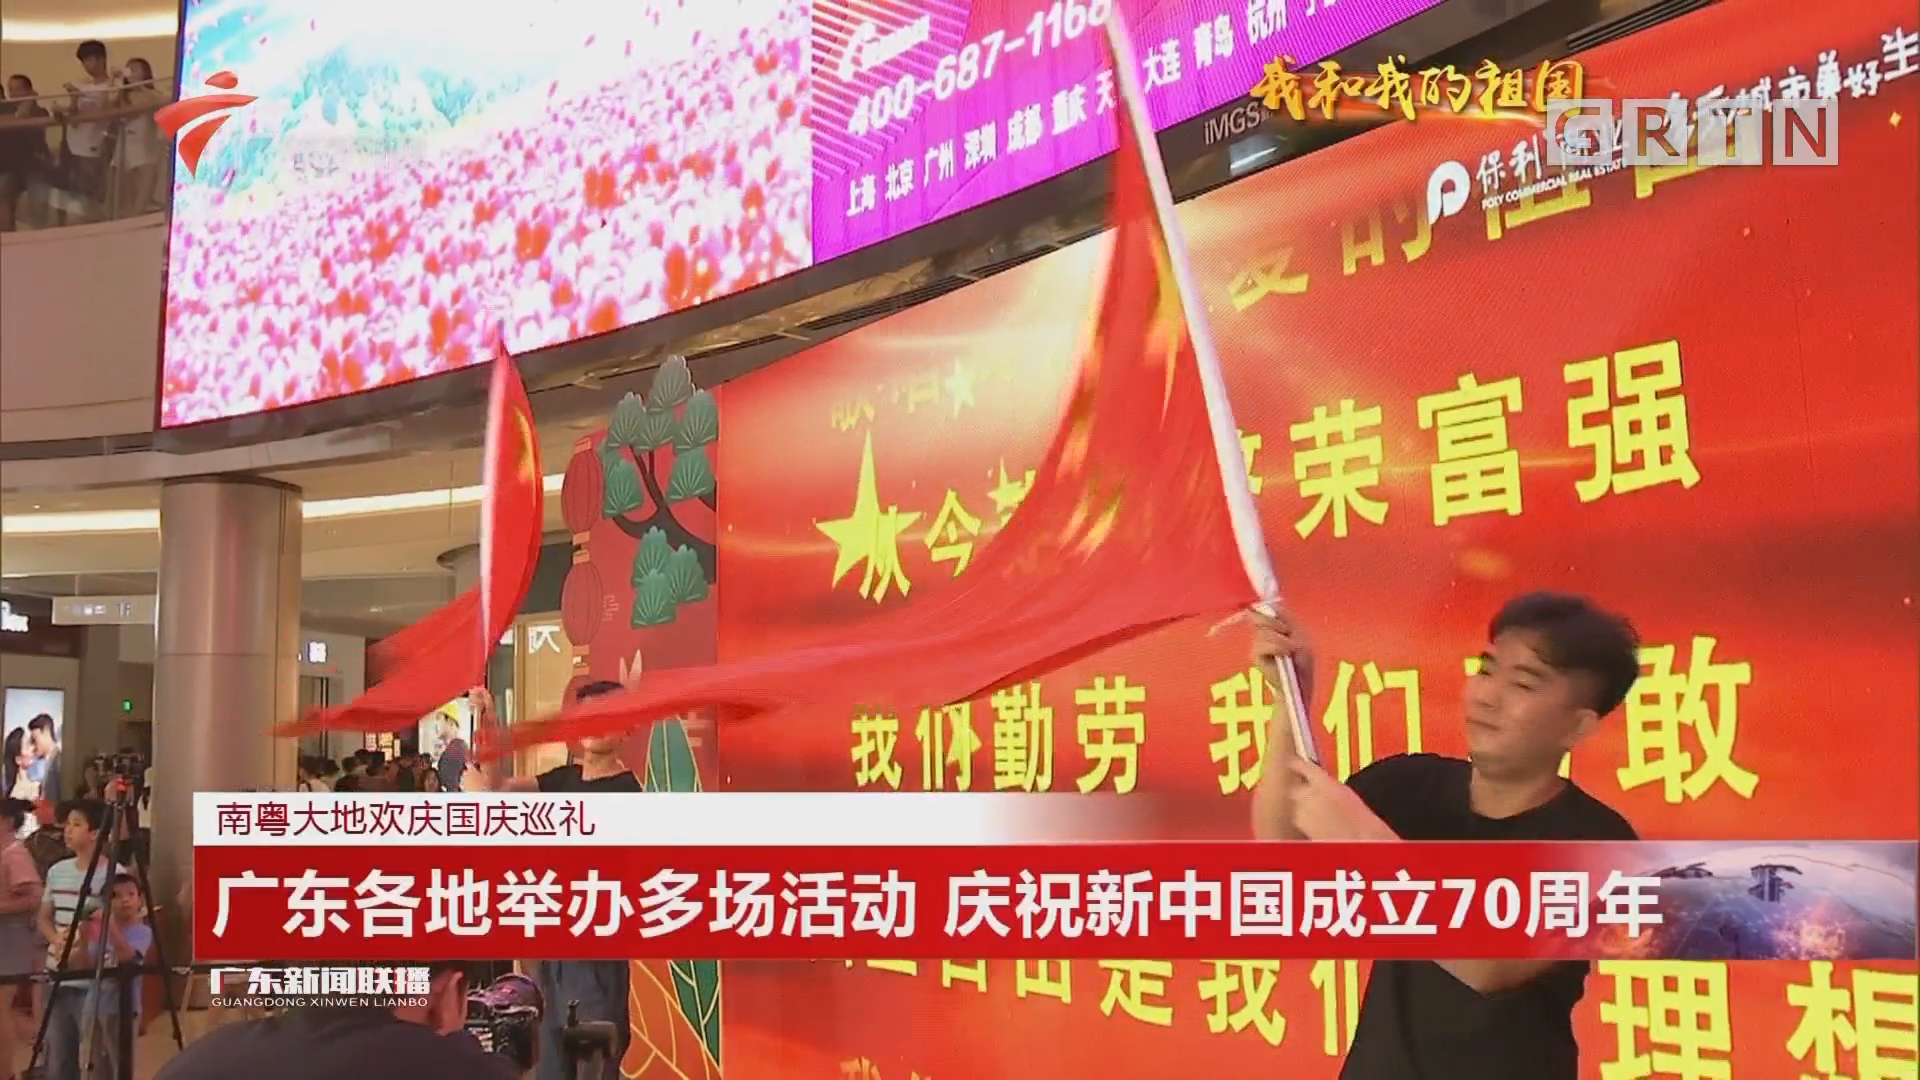 manbetx手机版 - 登陆各地举办多场活动 庆祝新中国成立70周年